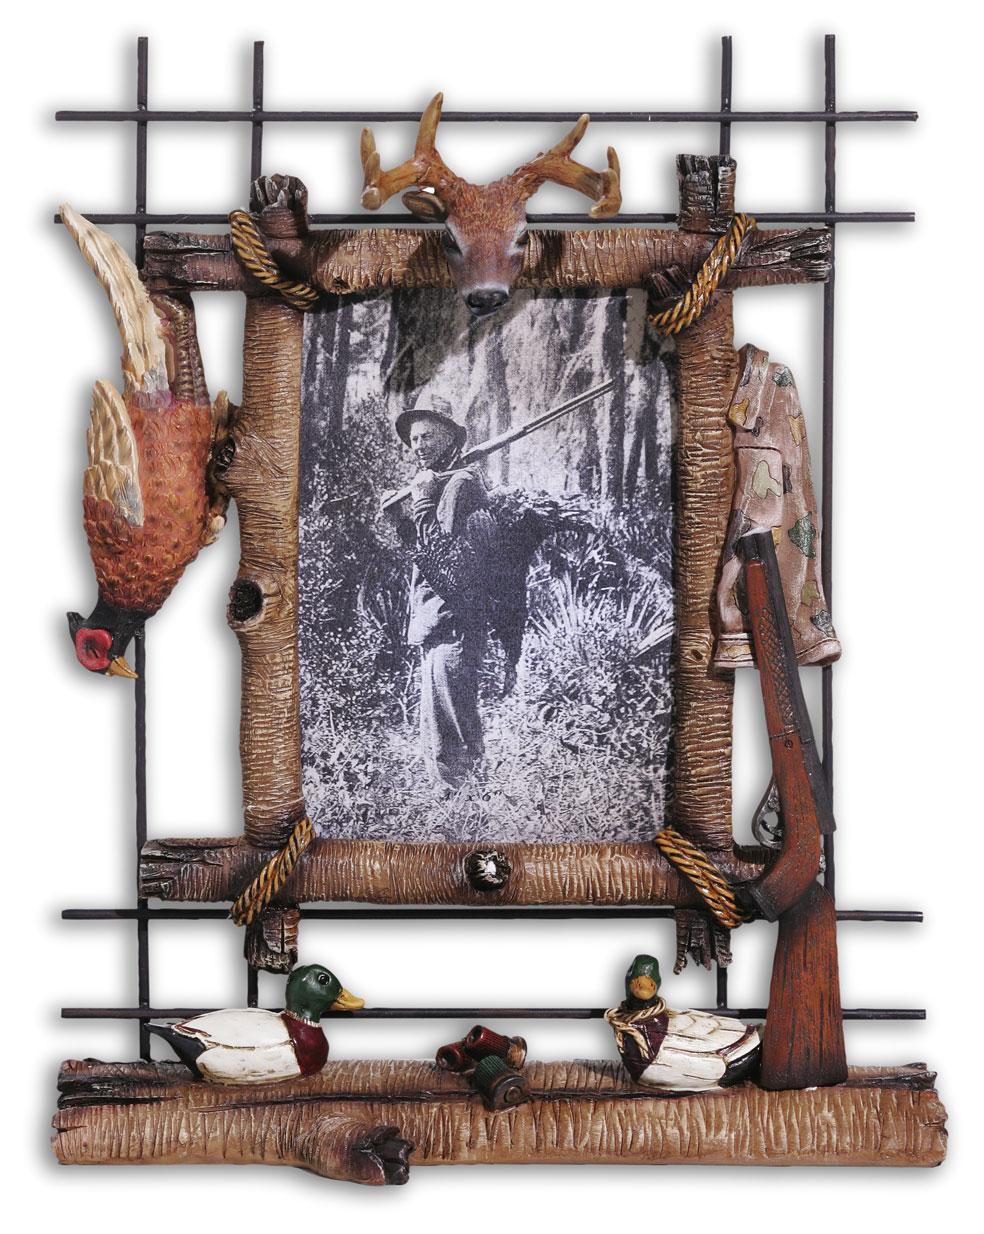 cadre photo fusil chasse na0365 grossiste cadeaux d corations figurines et peluches prix. Black Bedroom Furniture Sets. Home Design Ideas